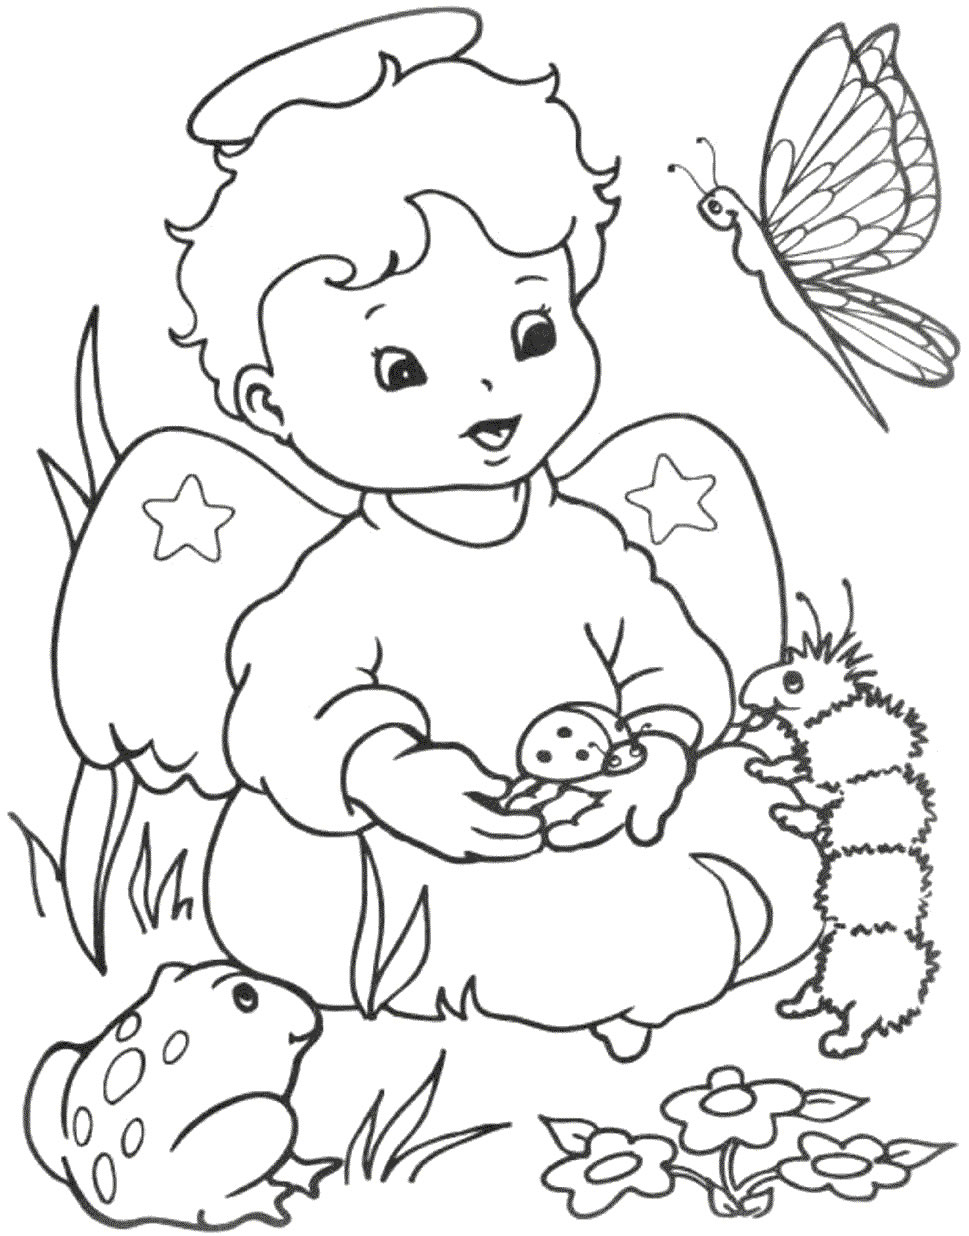 Anjos - Imagens para Colorir!